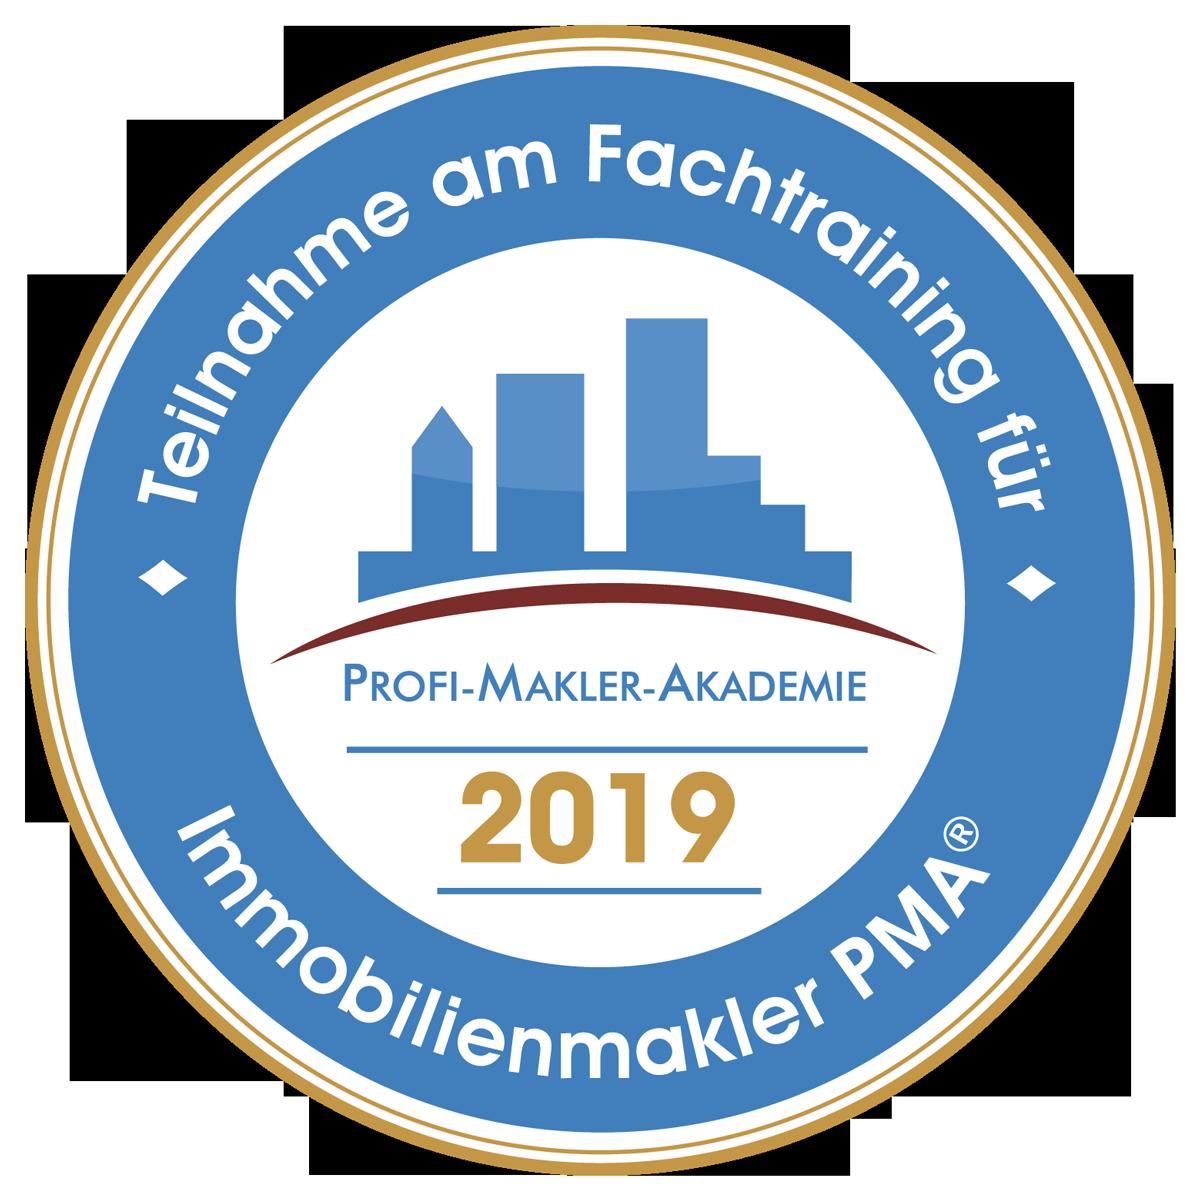 Emblem PMA Fachtraining